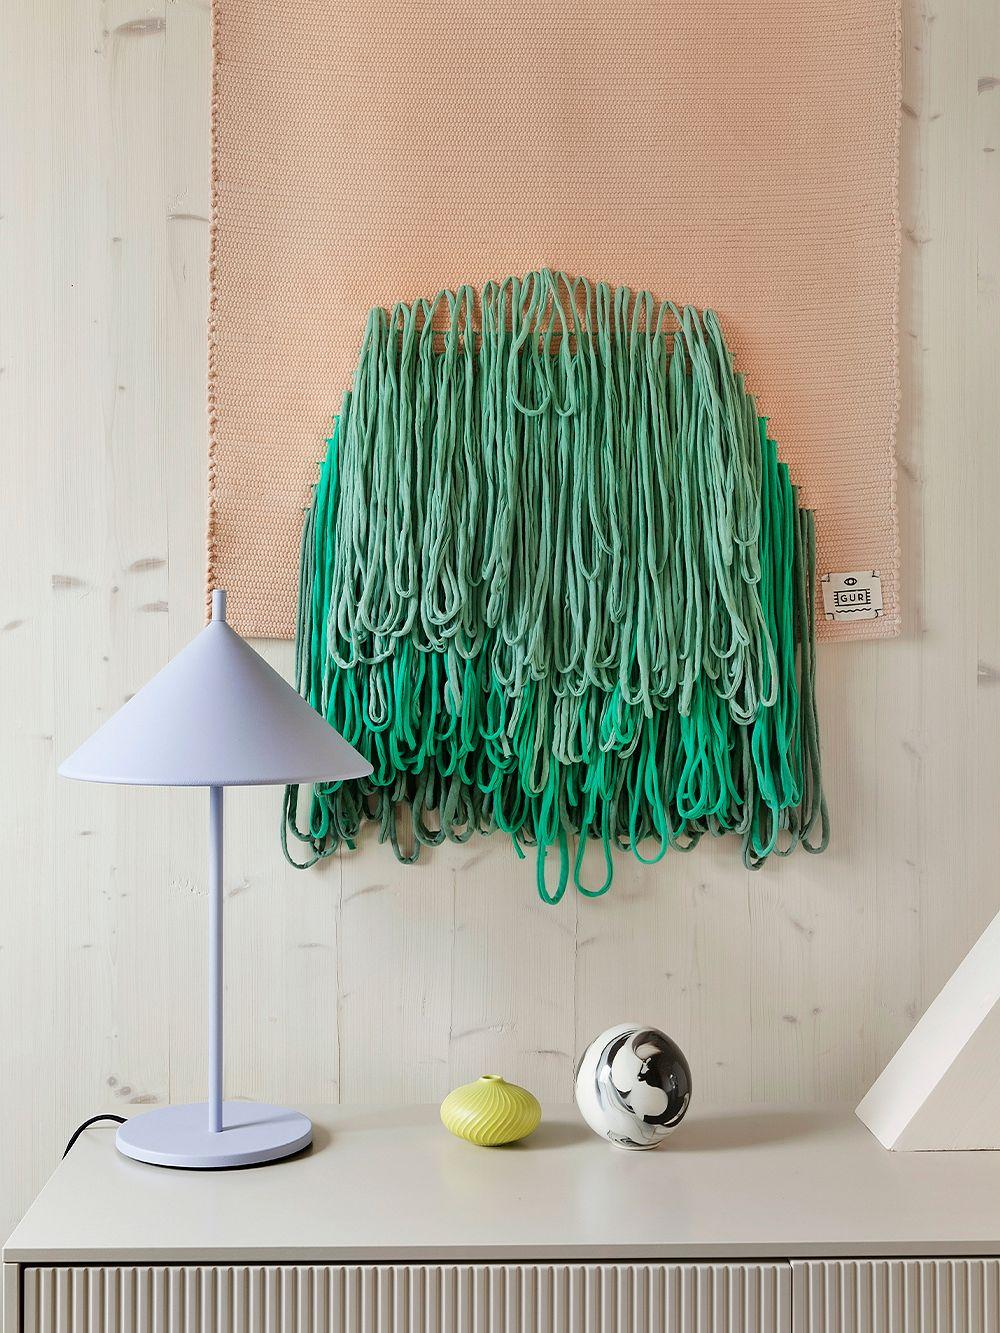 GUR textile art